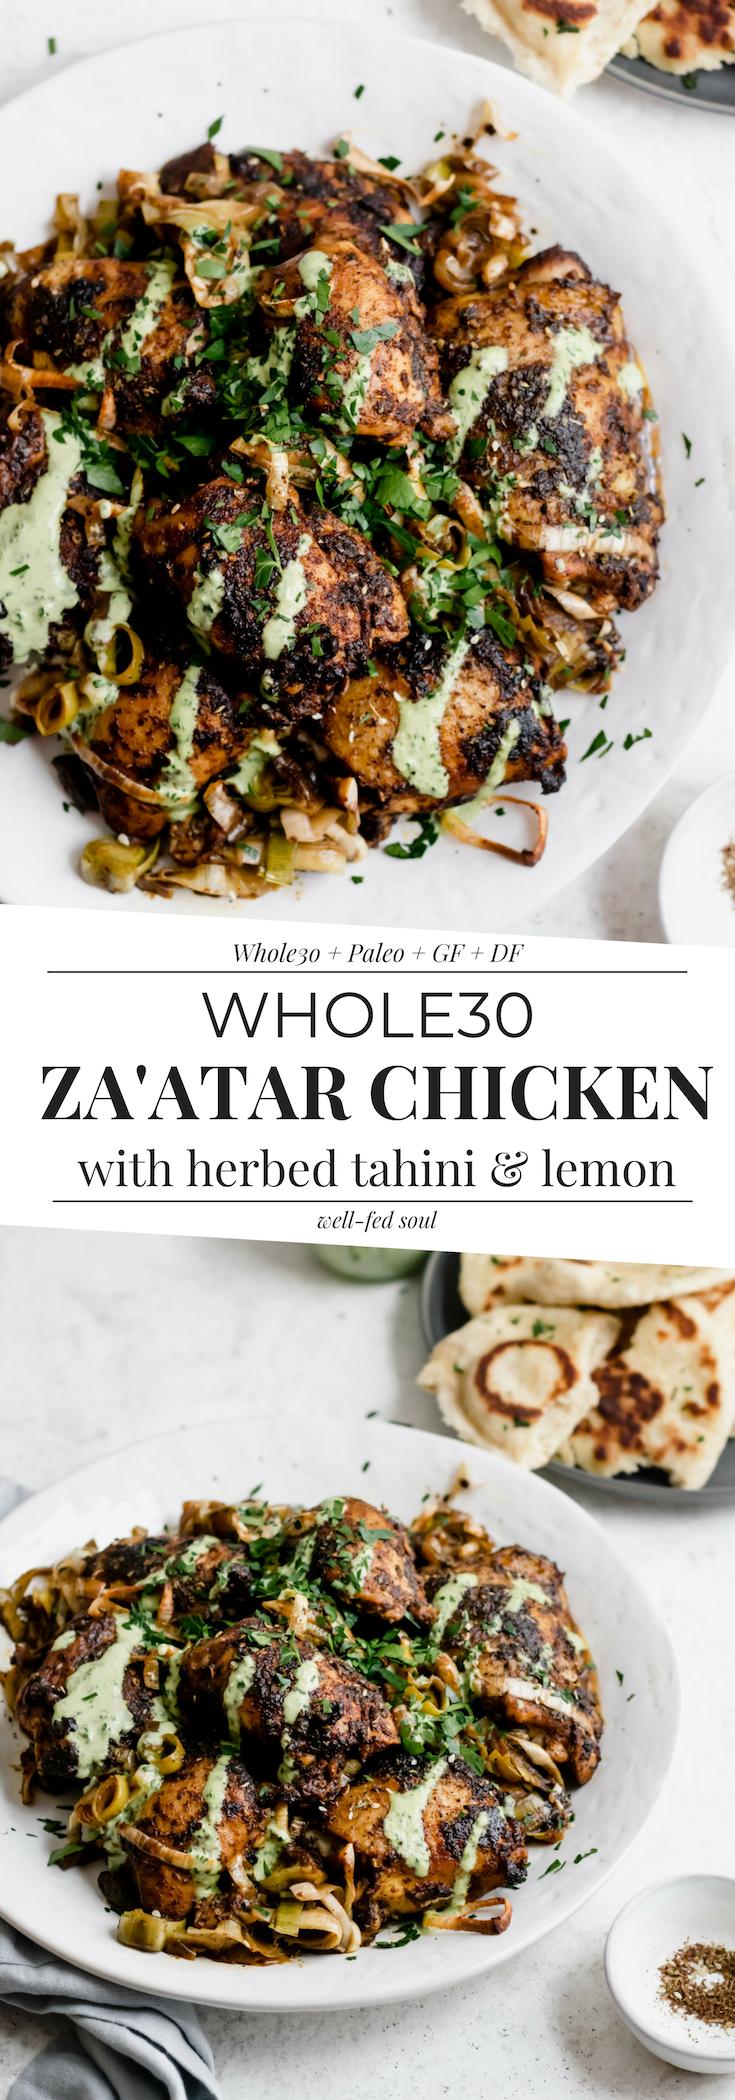 Weeknight Roasted Za'atar Chicken with Herbed Tahini & Leeks images